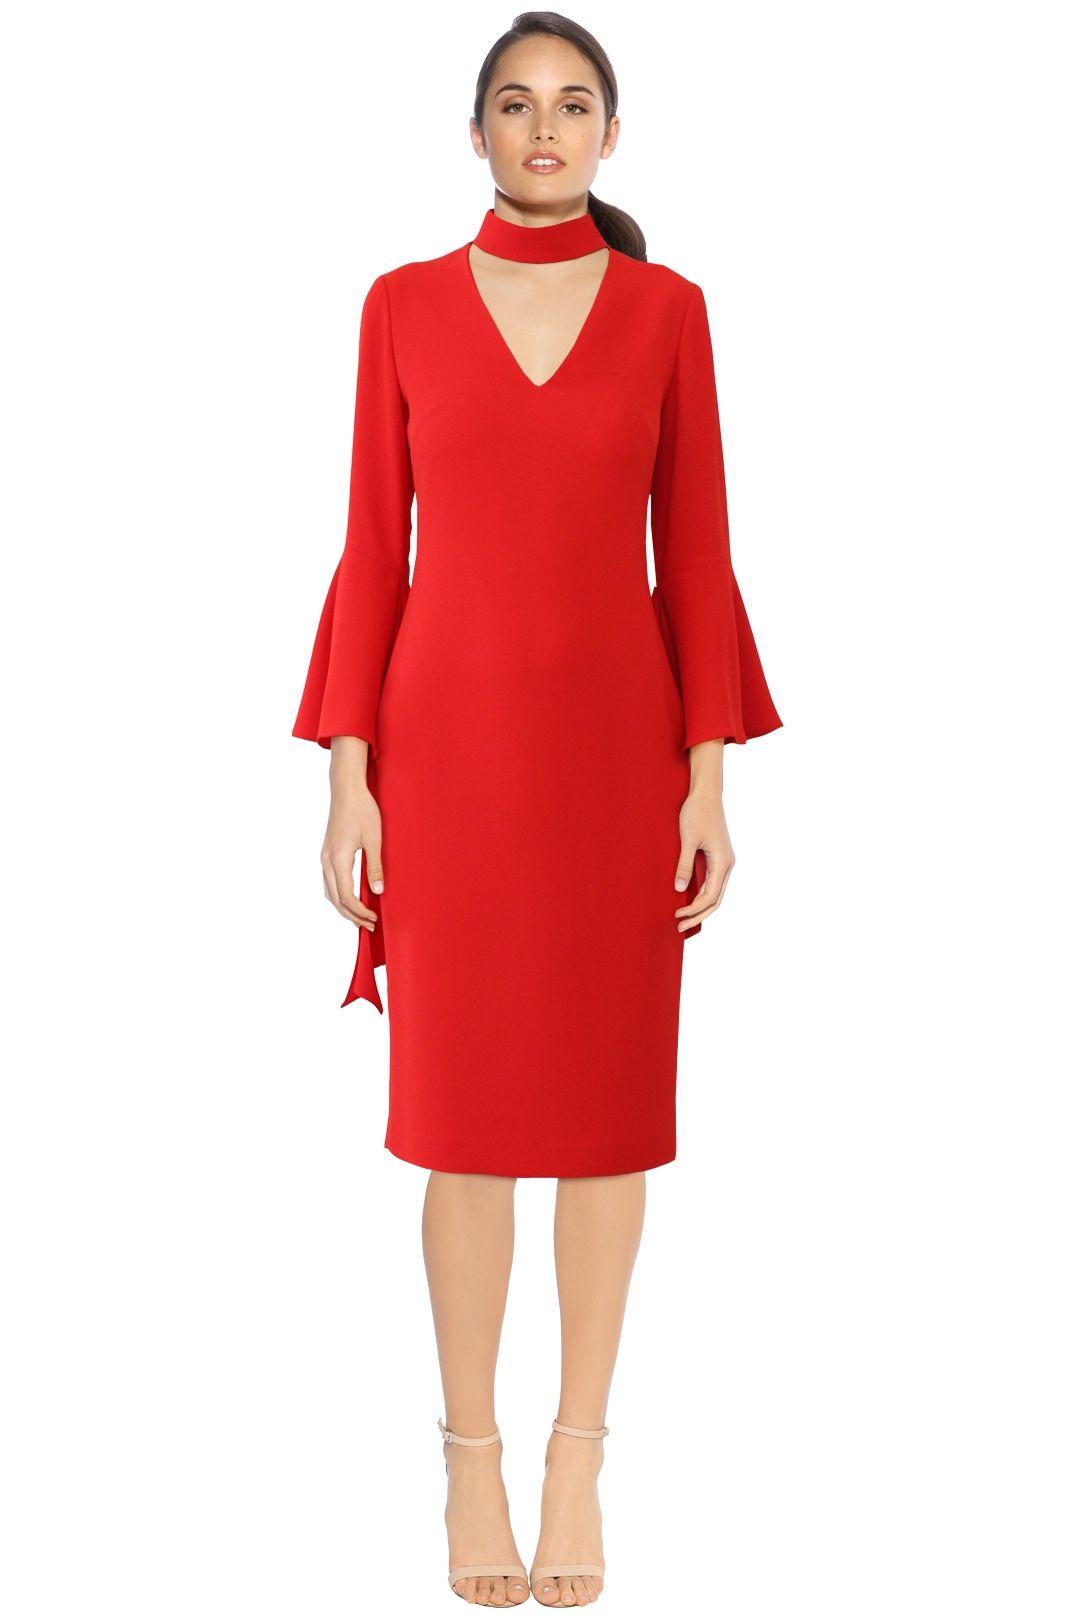 Carla Zampatti - Senorina Dress - Red - Front